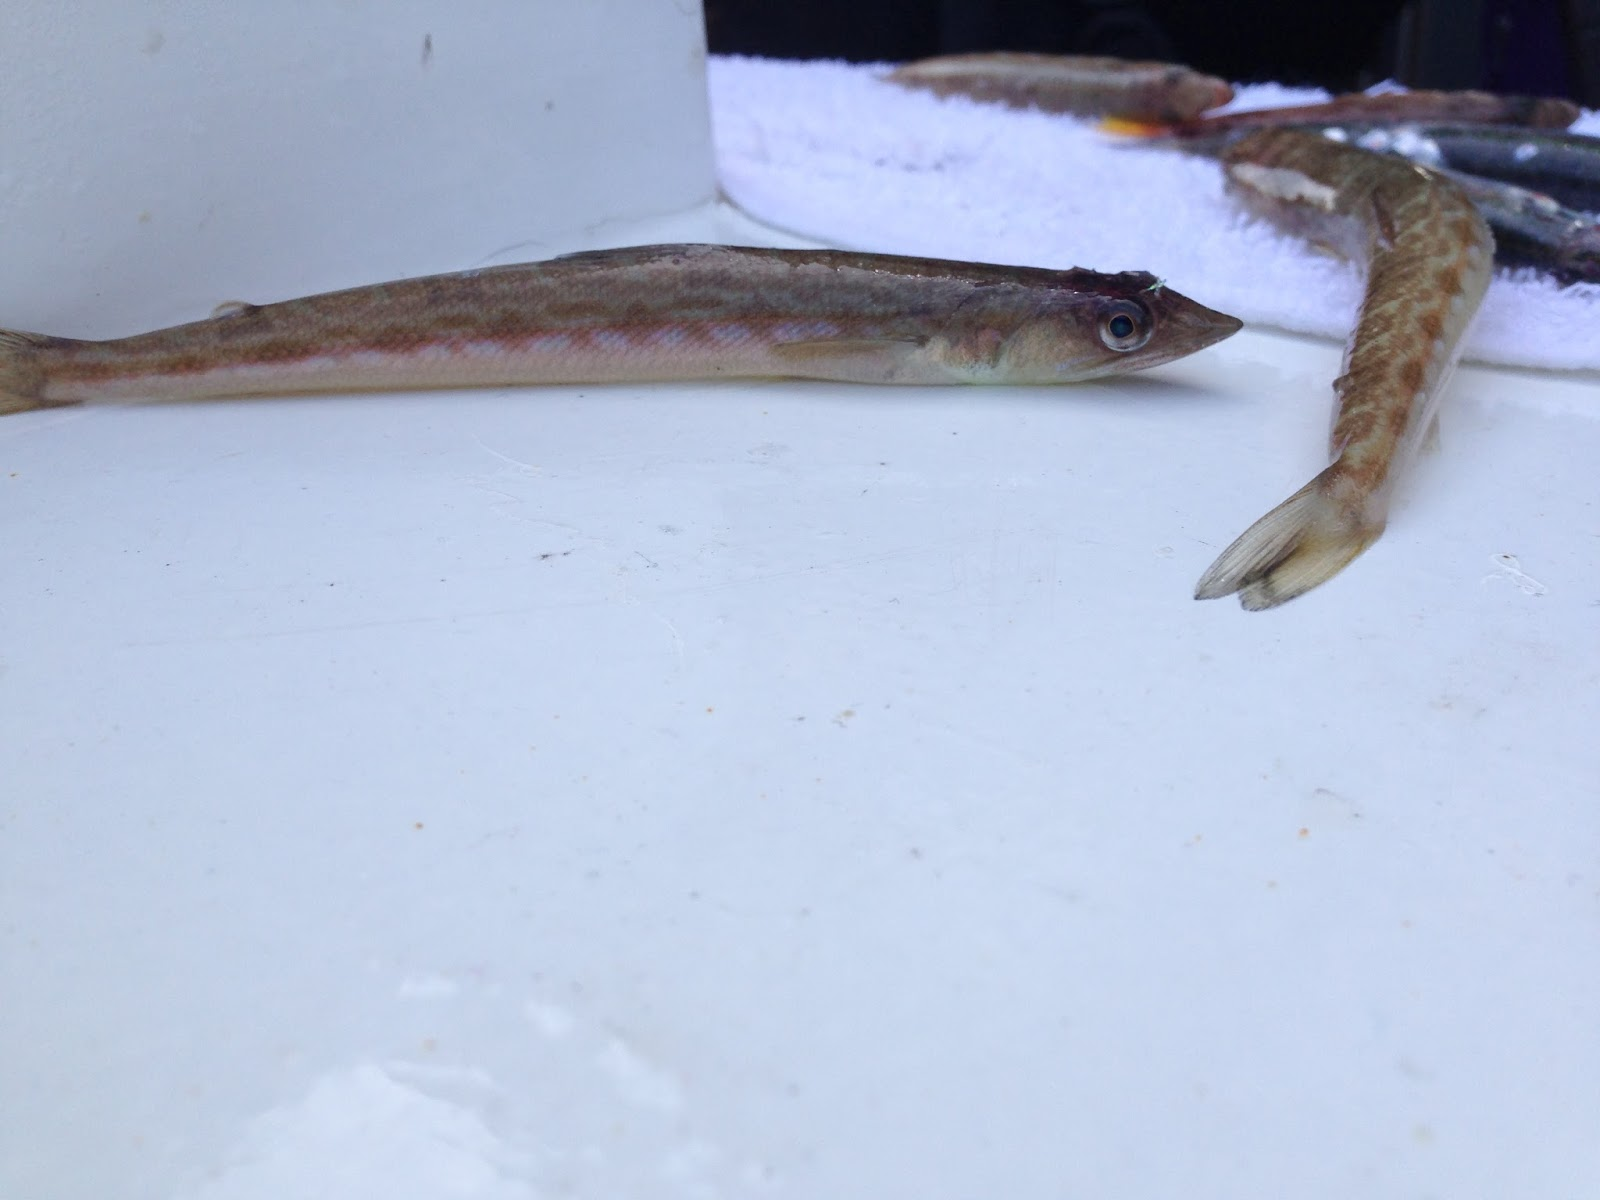 Debi shearwater 39 s journeys half moon bay pelagic trip for Warm water fish